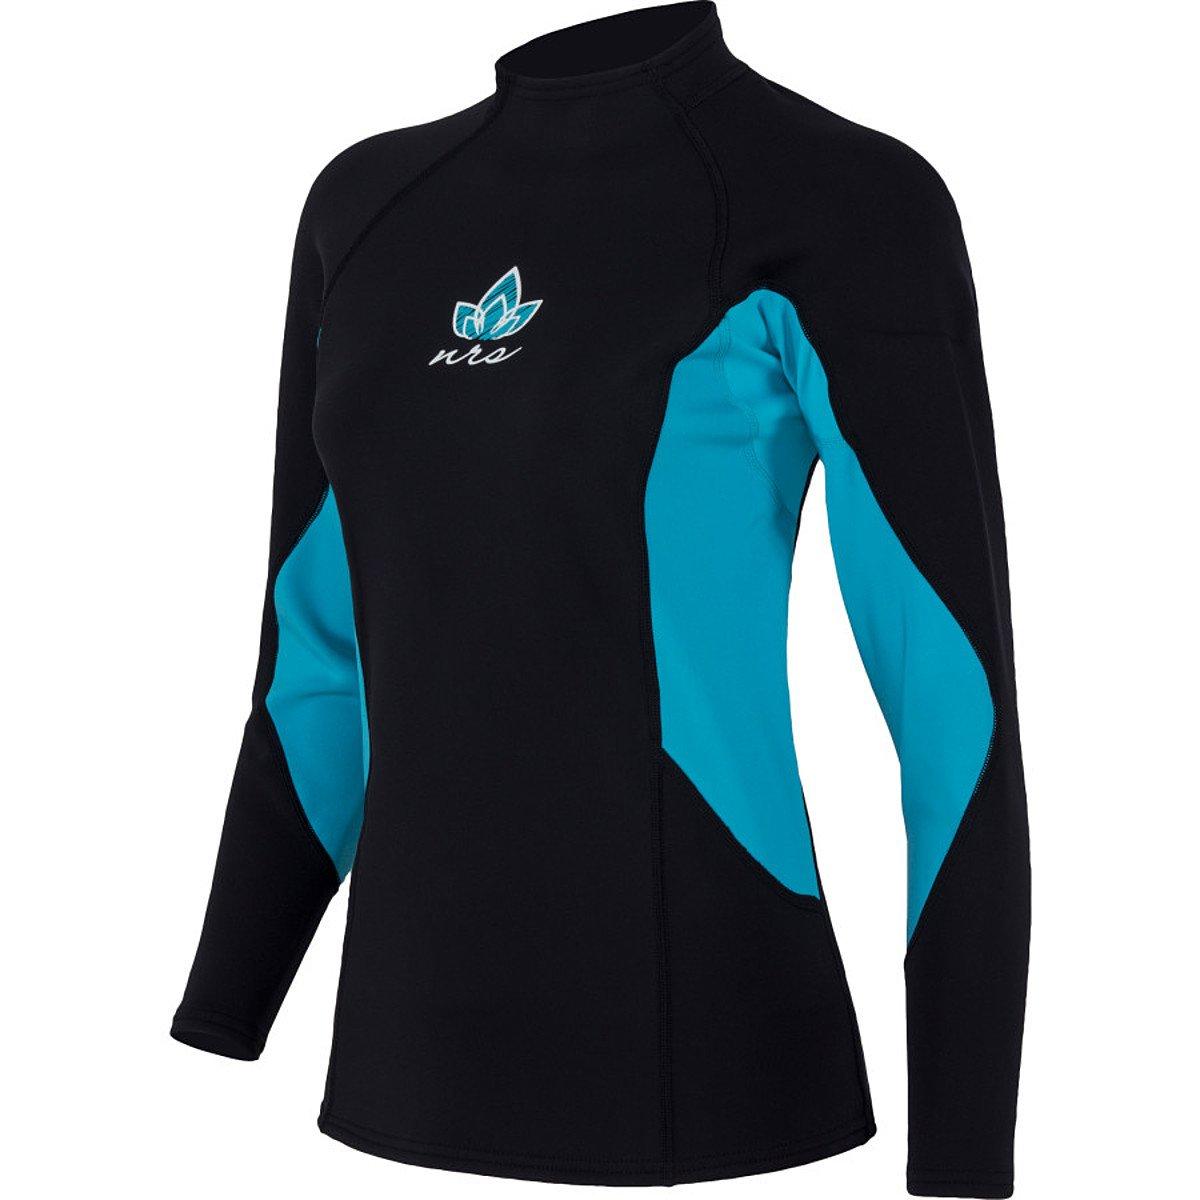 NRS HydroSkin 0.5 LS Shirt - Women's Black / Ocean XS by NRS